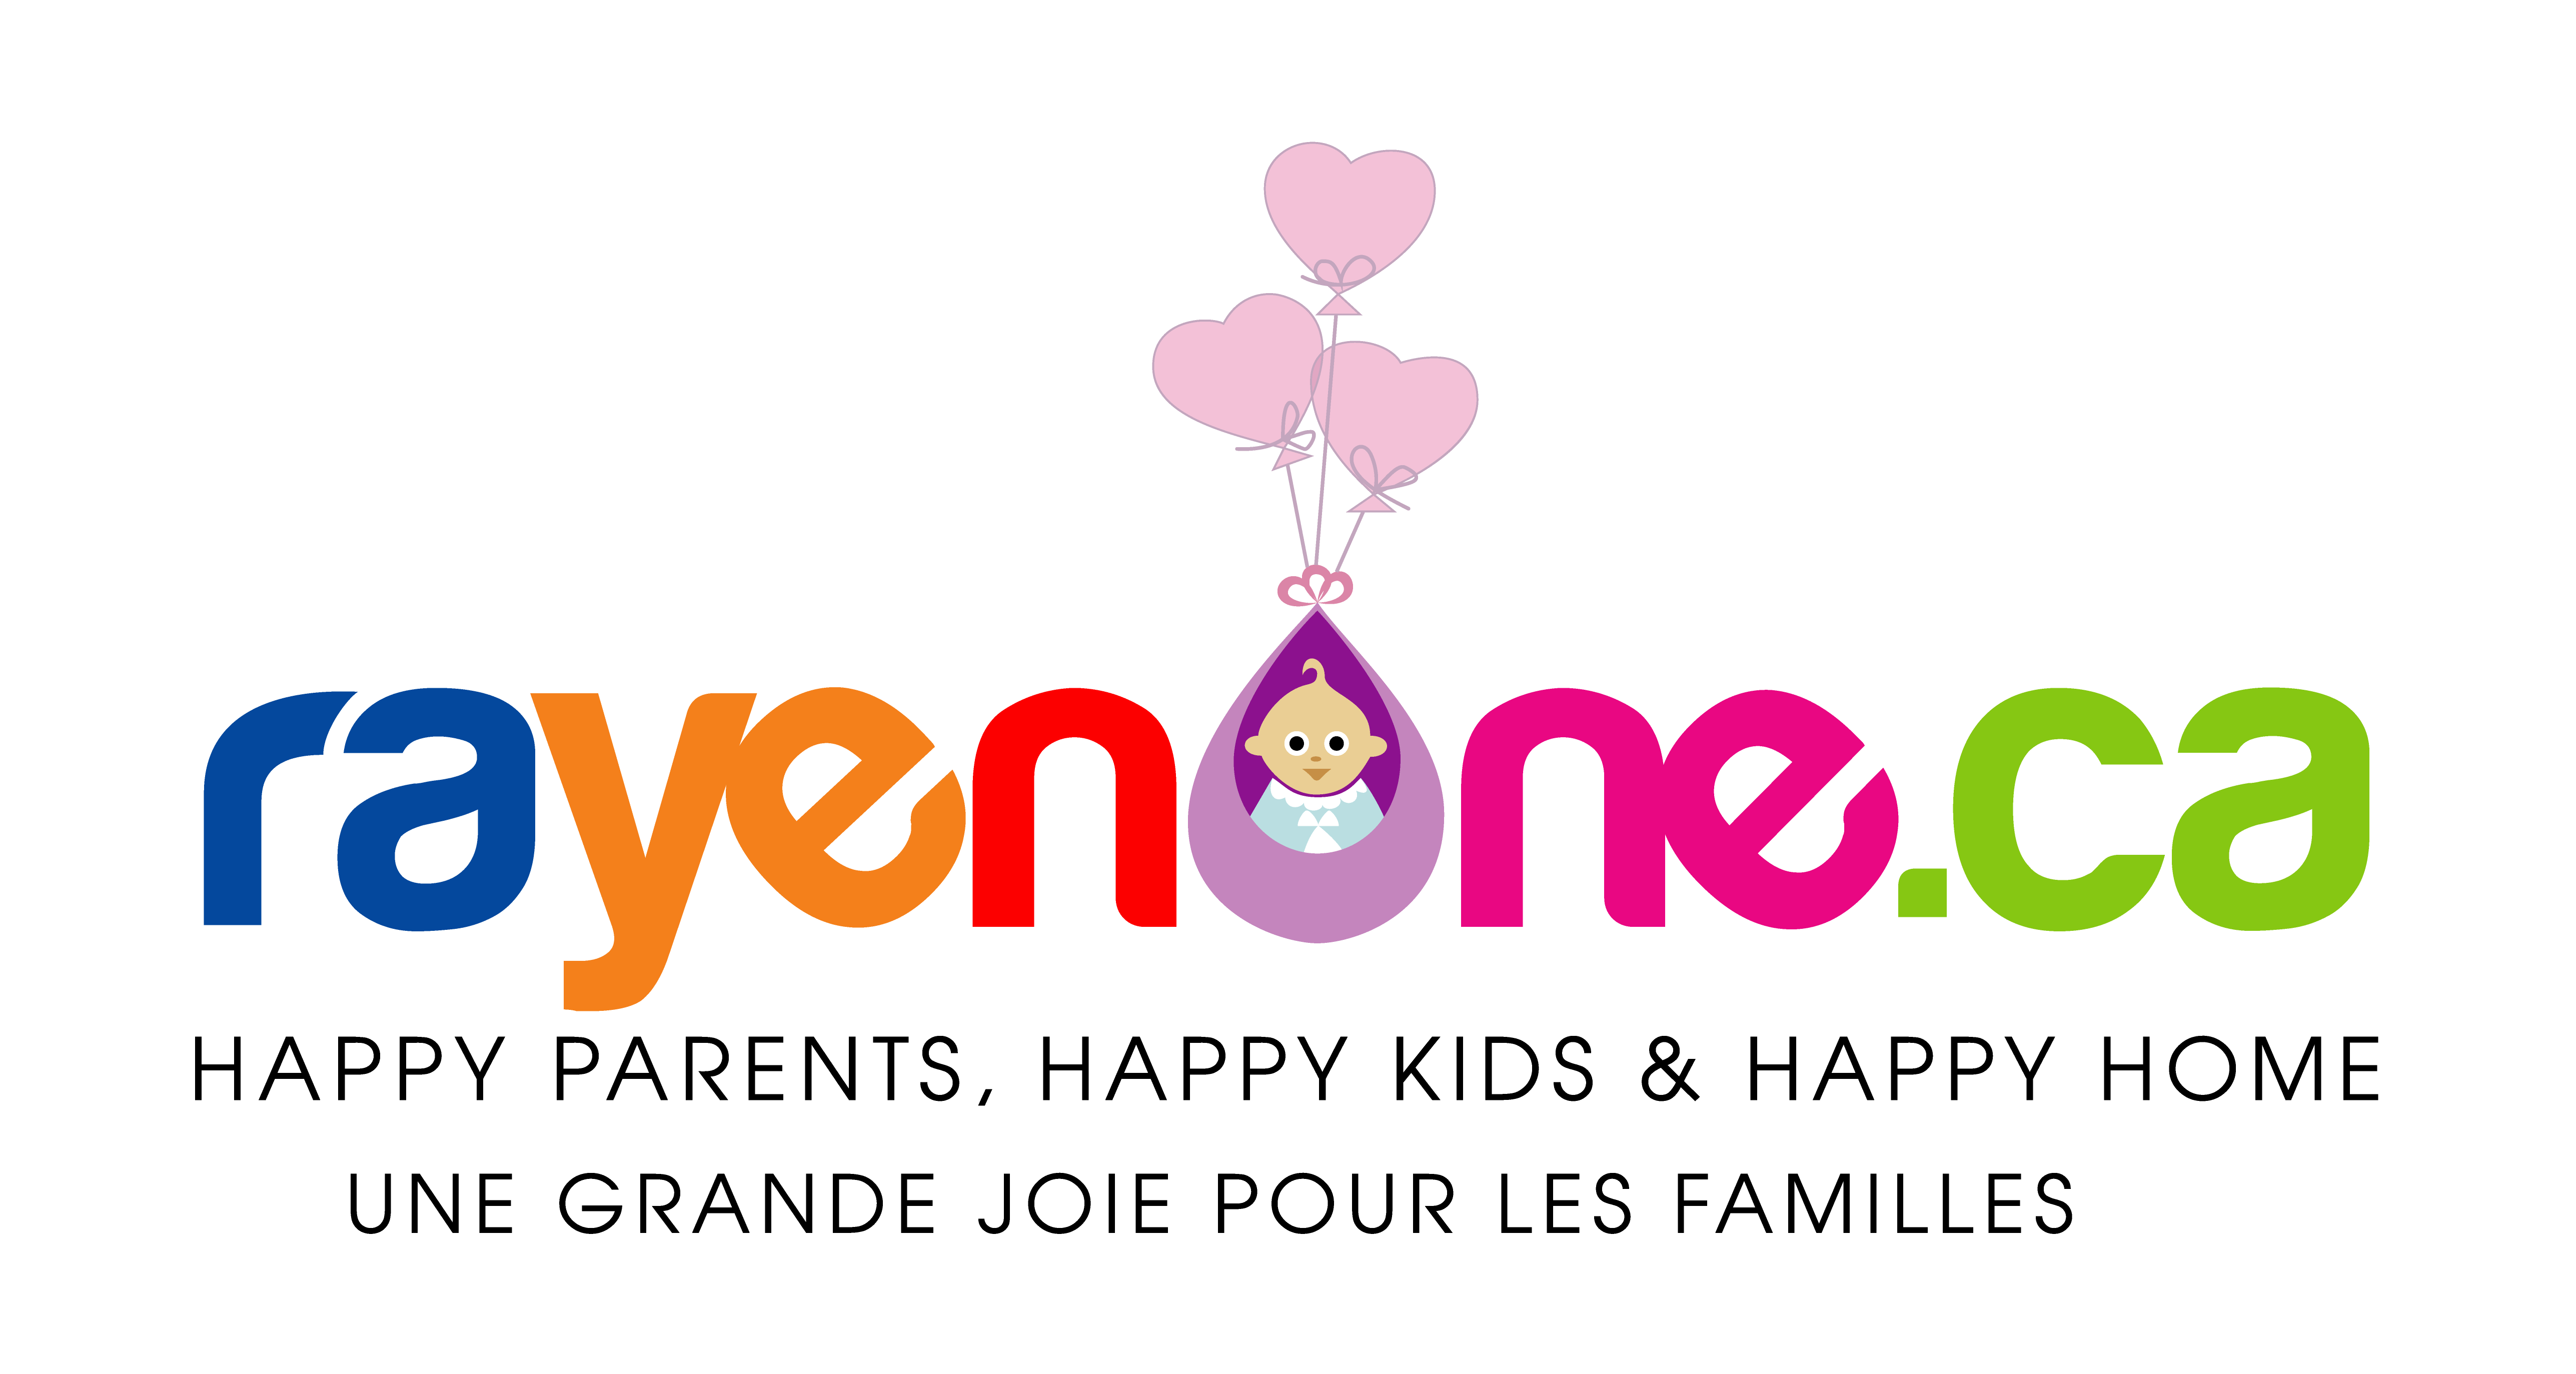 RayEnone.ca